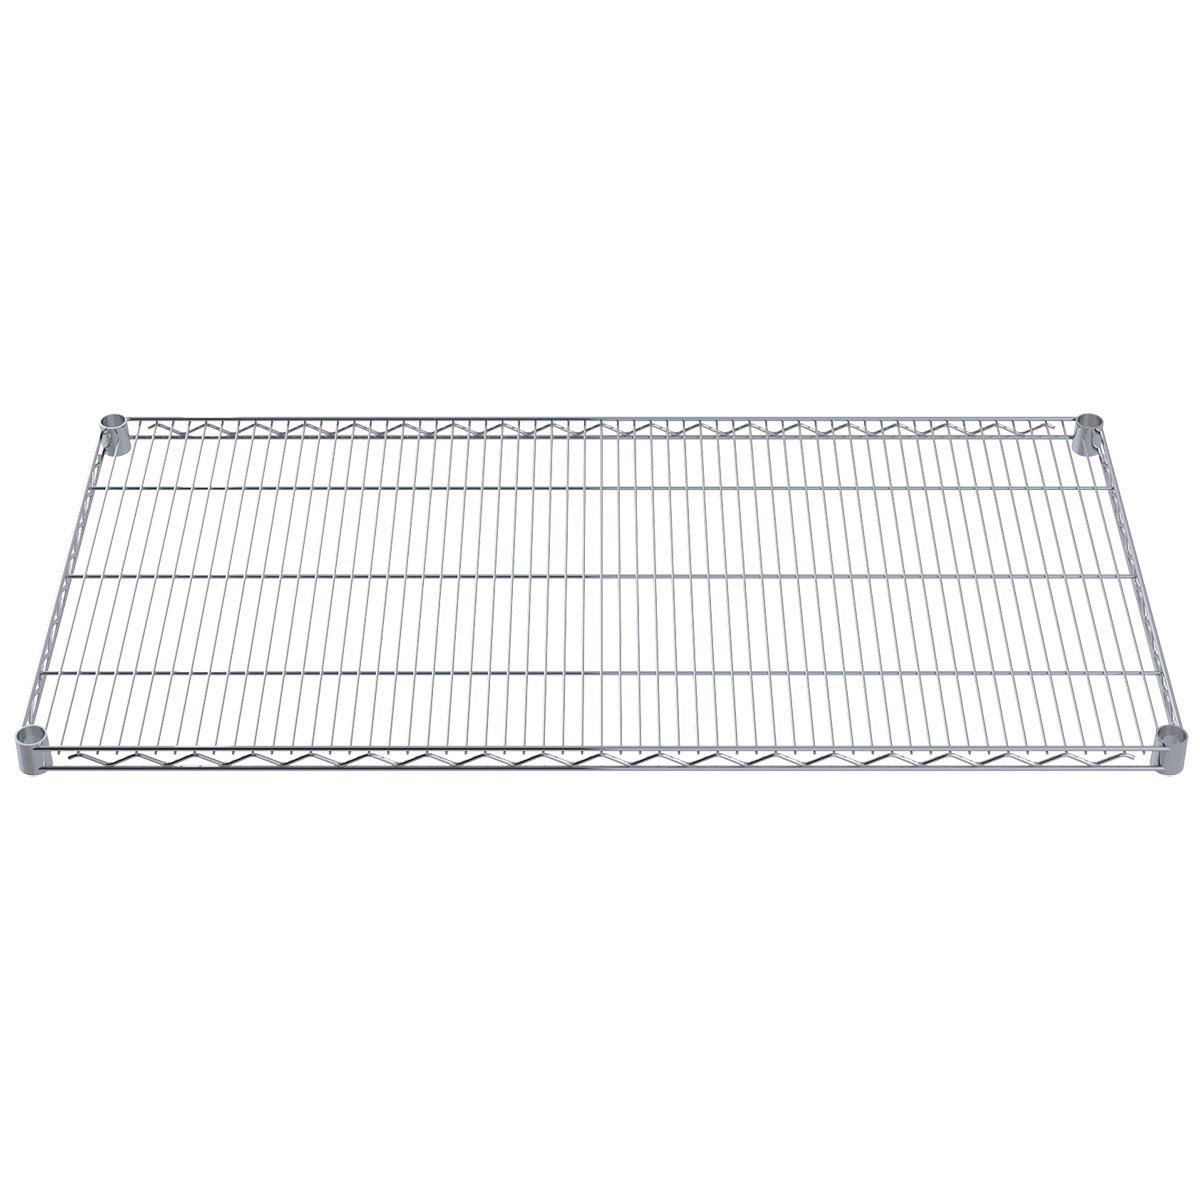 Akro-Mils AWS2448SHELF 24-Inch X 48-Inch NSF Approved Industrial Grade Chrome Wire Shelf, 4-Pack